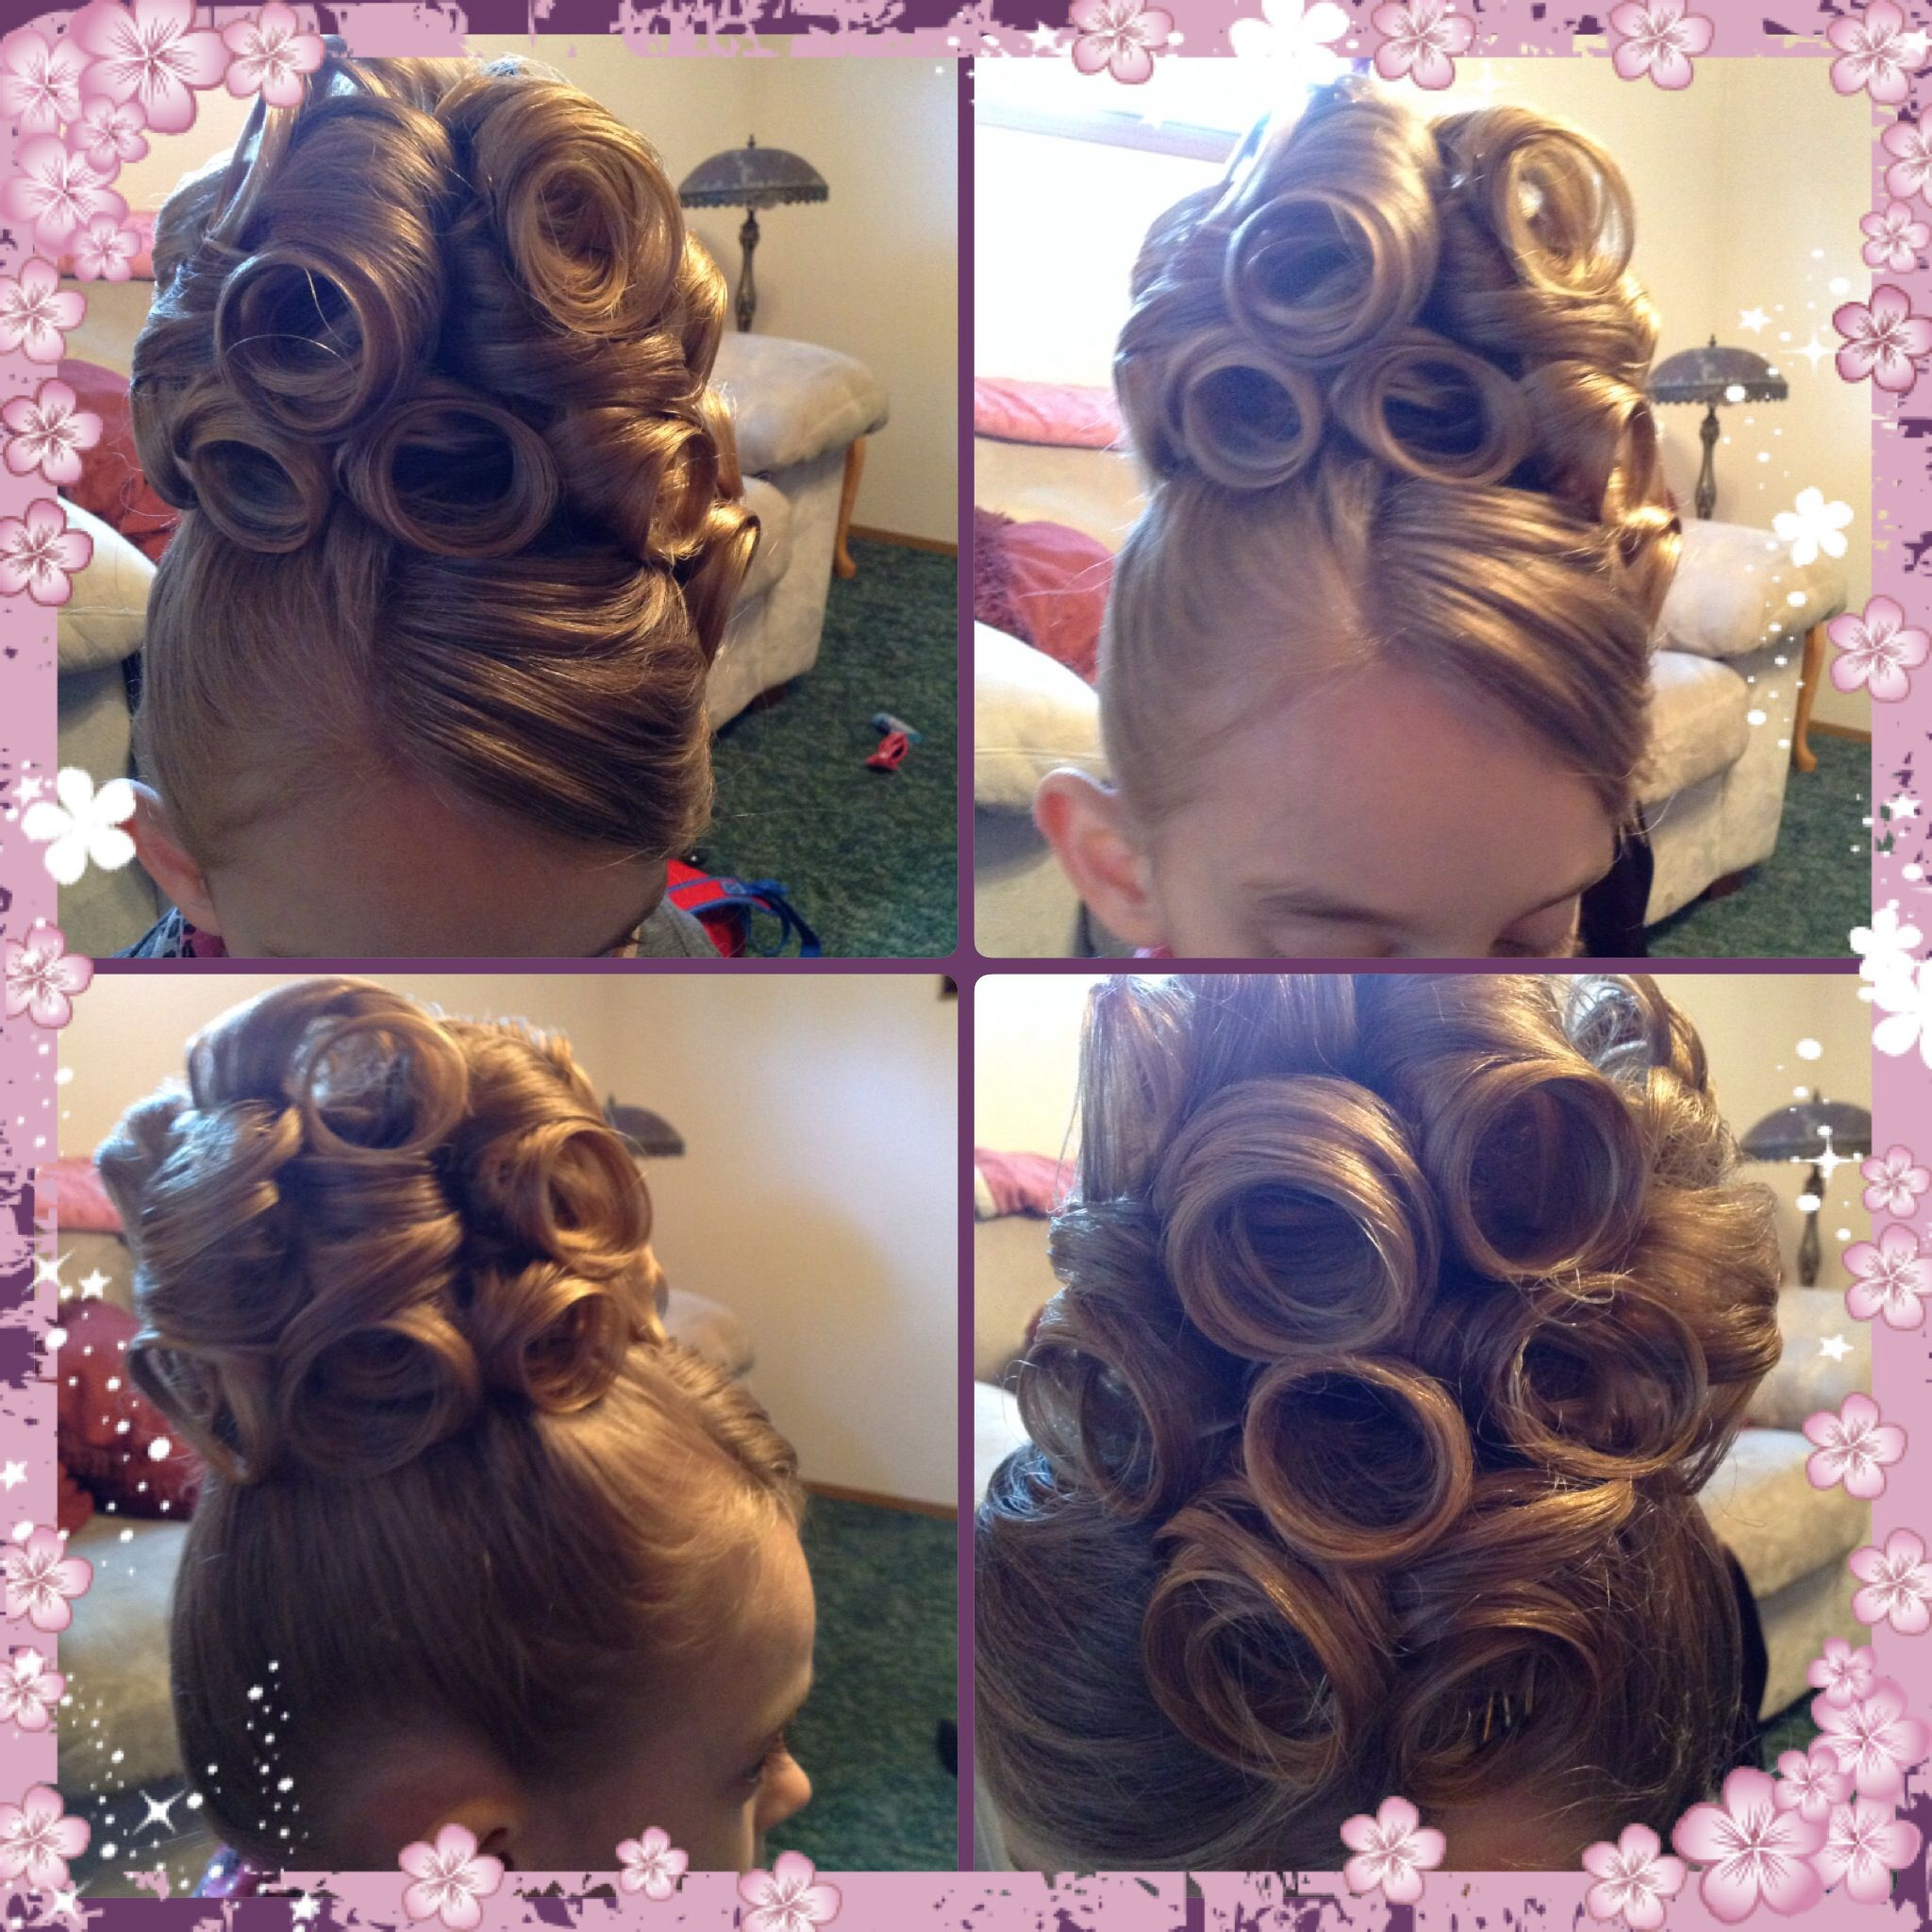 #apostolic #updo #hair hair inspiration